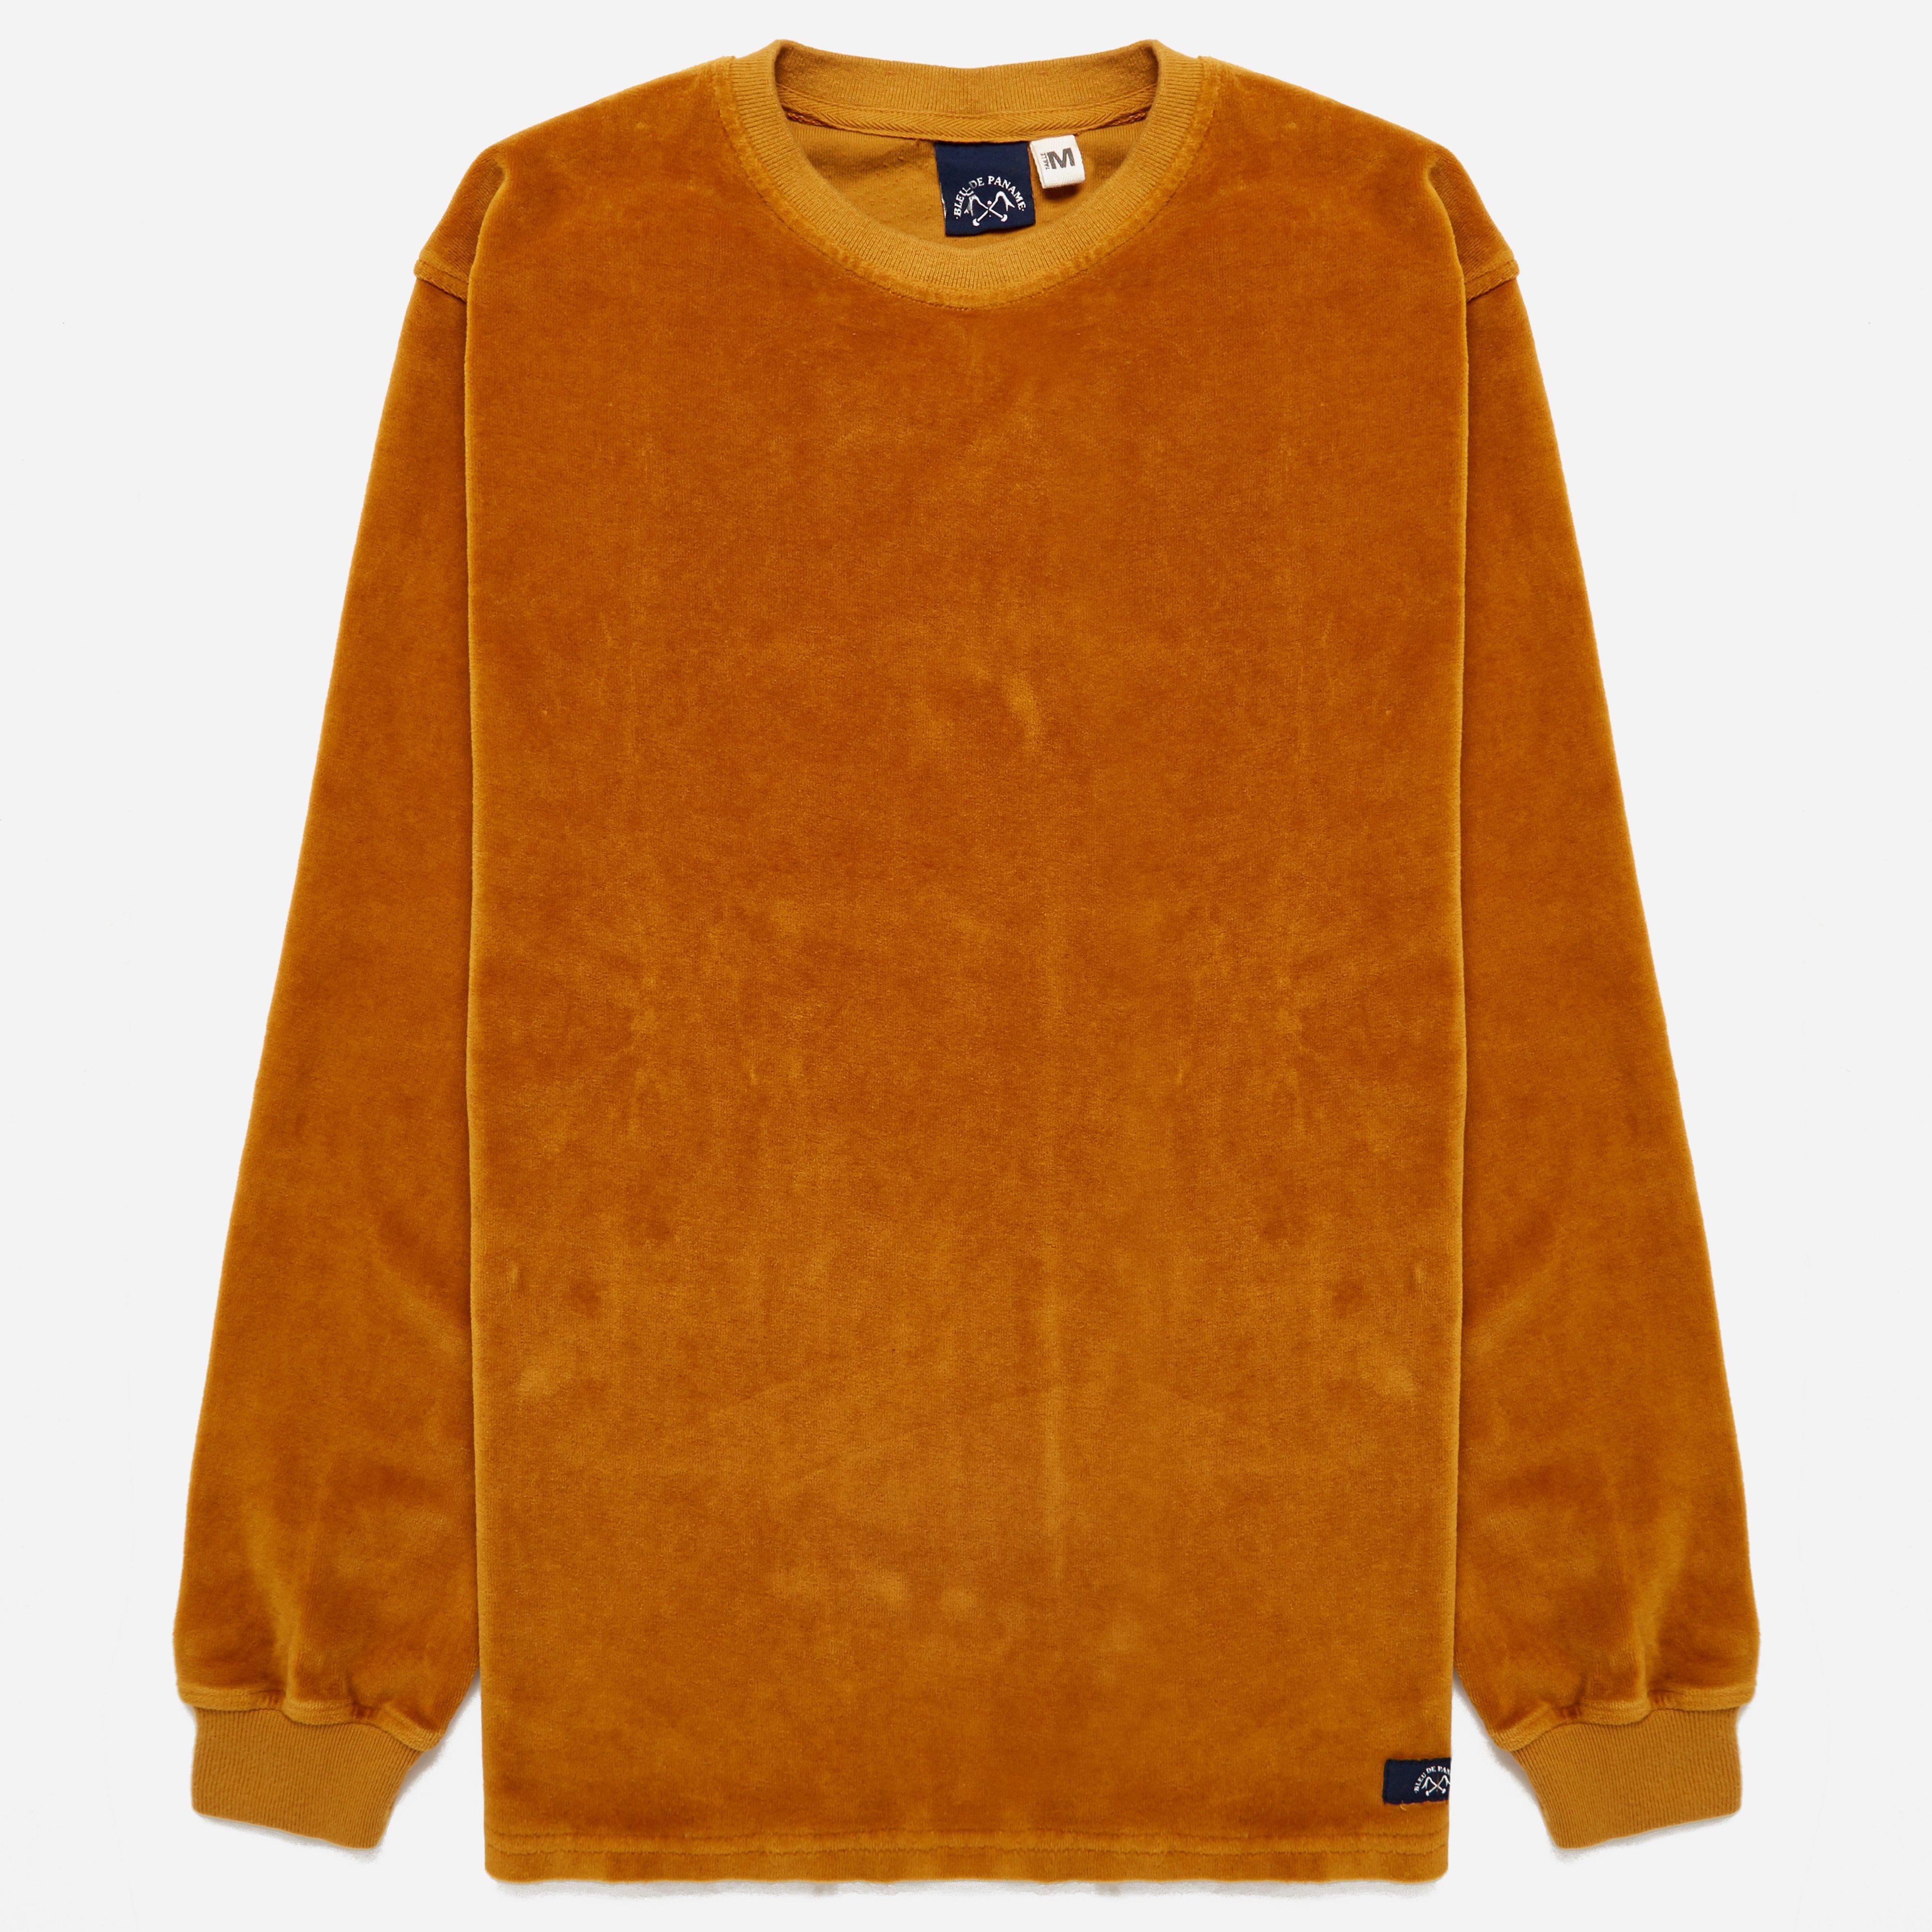 Bleu De Paname Peau De Peche Sweatshirt